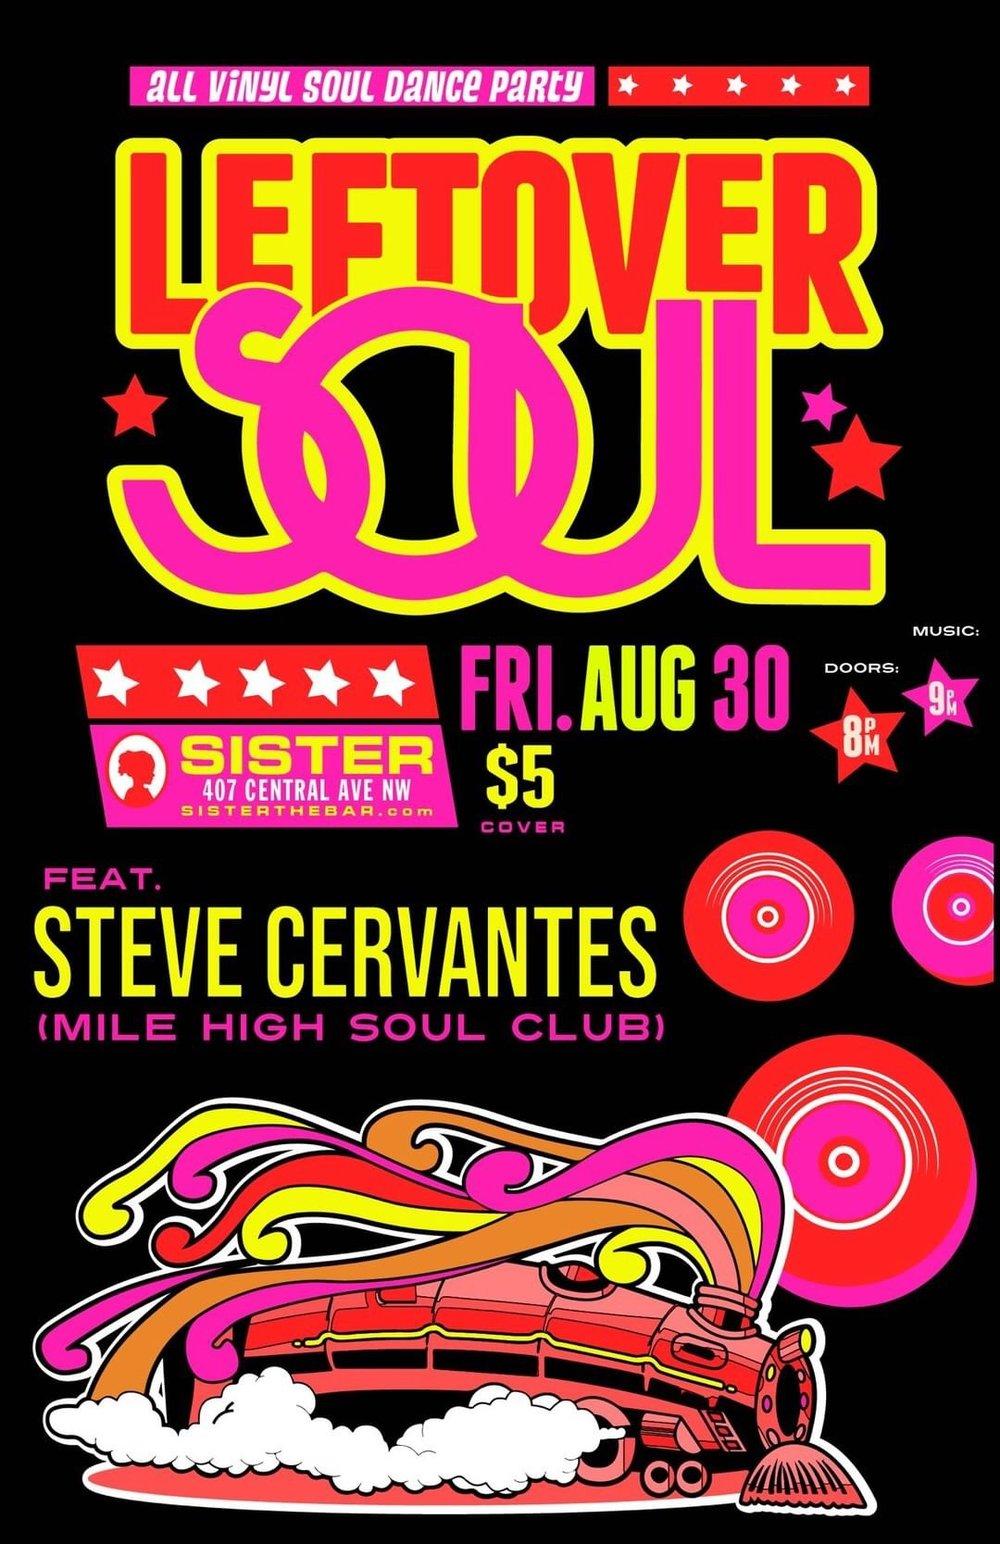 Mile High Soul Club